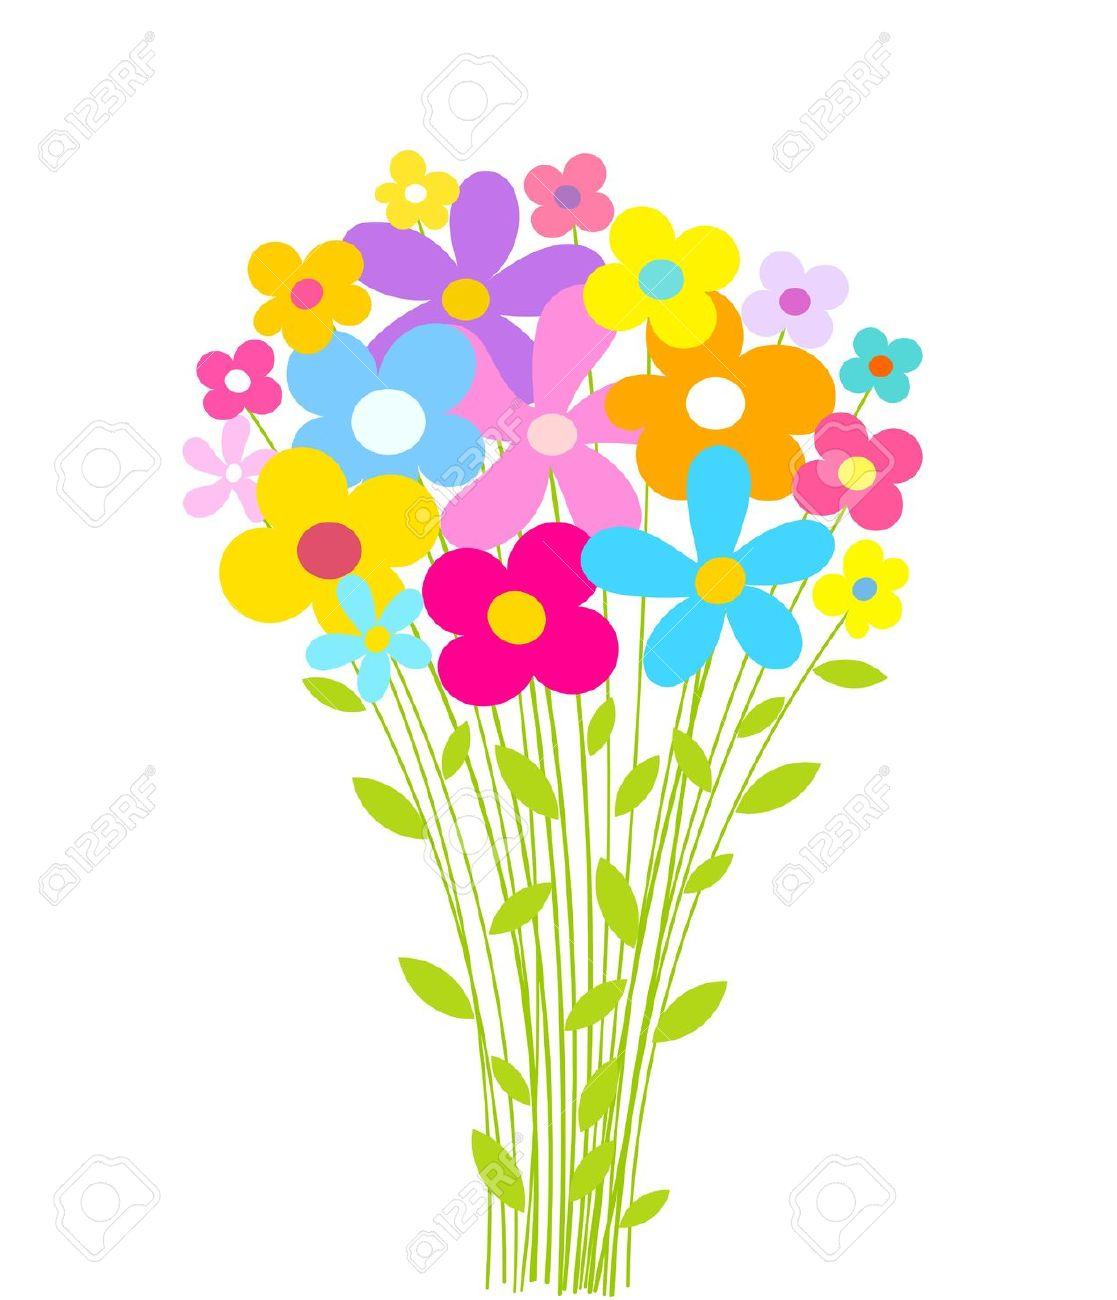 Bouquet clipart spring flower bouquet, Bouquet spring flower.